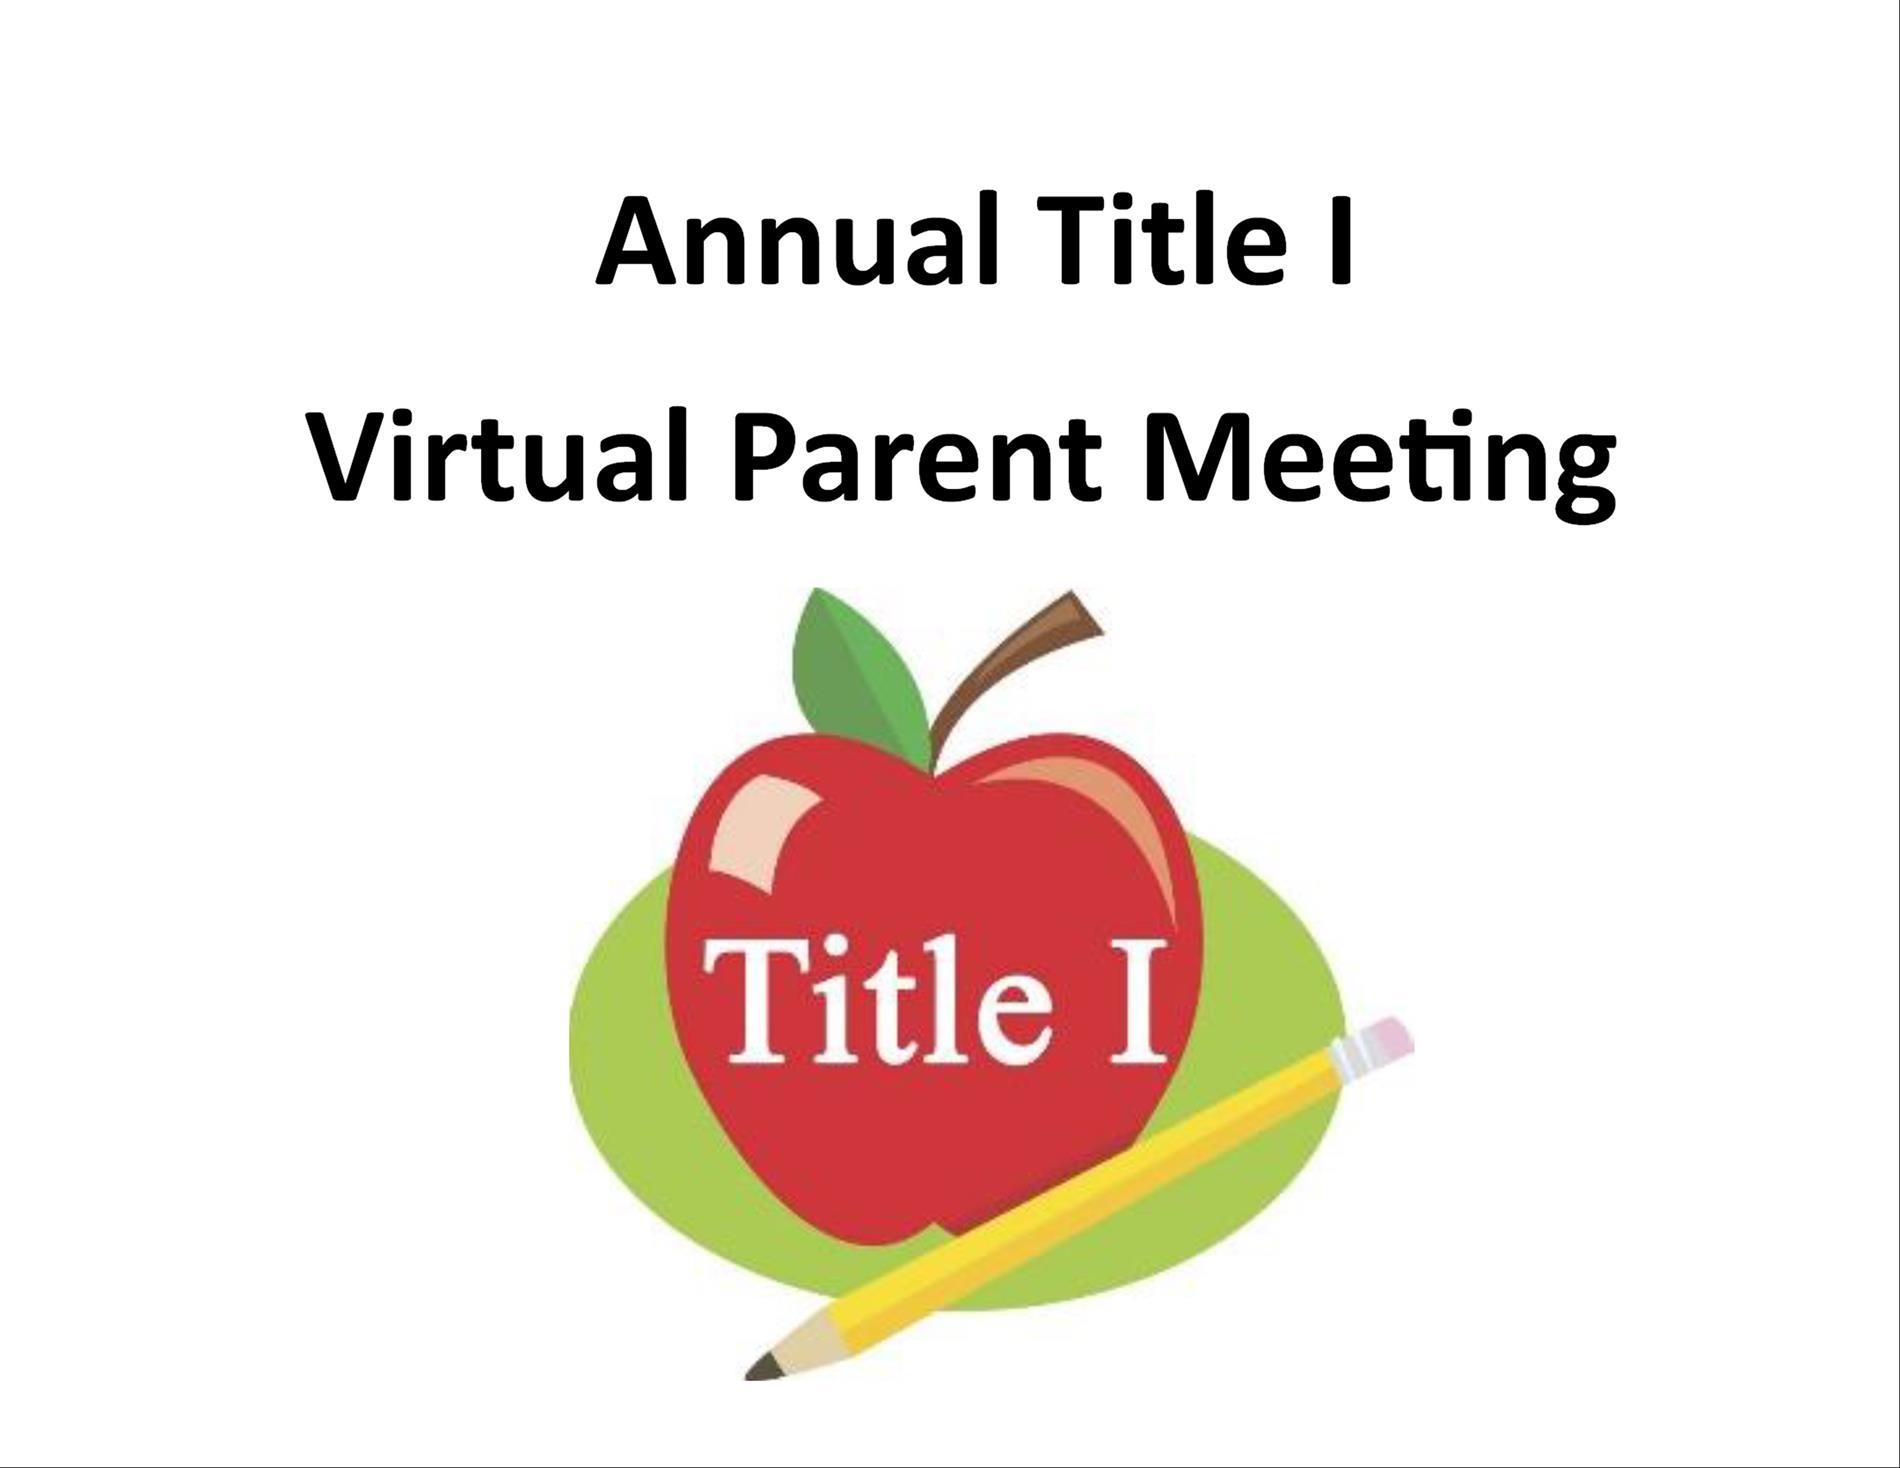 Annual Title I Virtual Parent Meeting Monday, September 20, 2021 9:00 AM- 9:30 AM & 4:00 PM – 4:30 PM